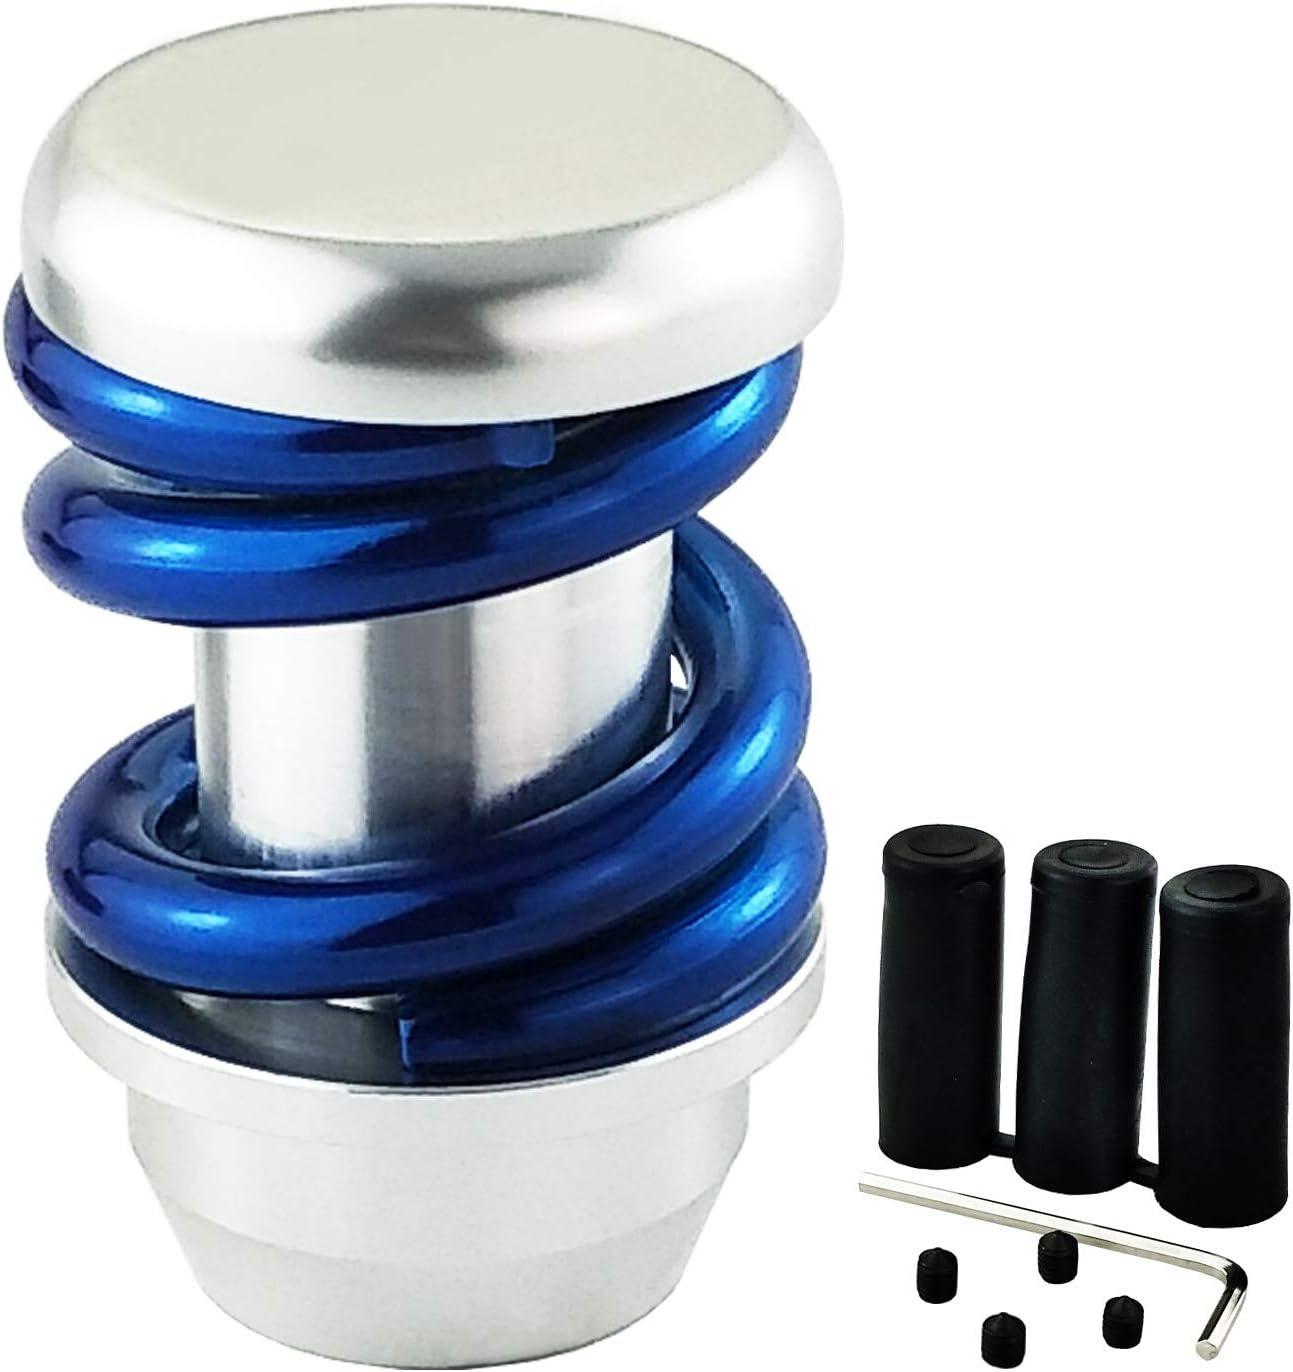 LUNSOM Manual Automatic Transmission Universal Car Shifter Knob Blue Aluminium Alloy Knobs Shift Gear Stick Head